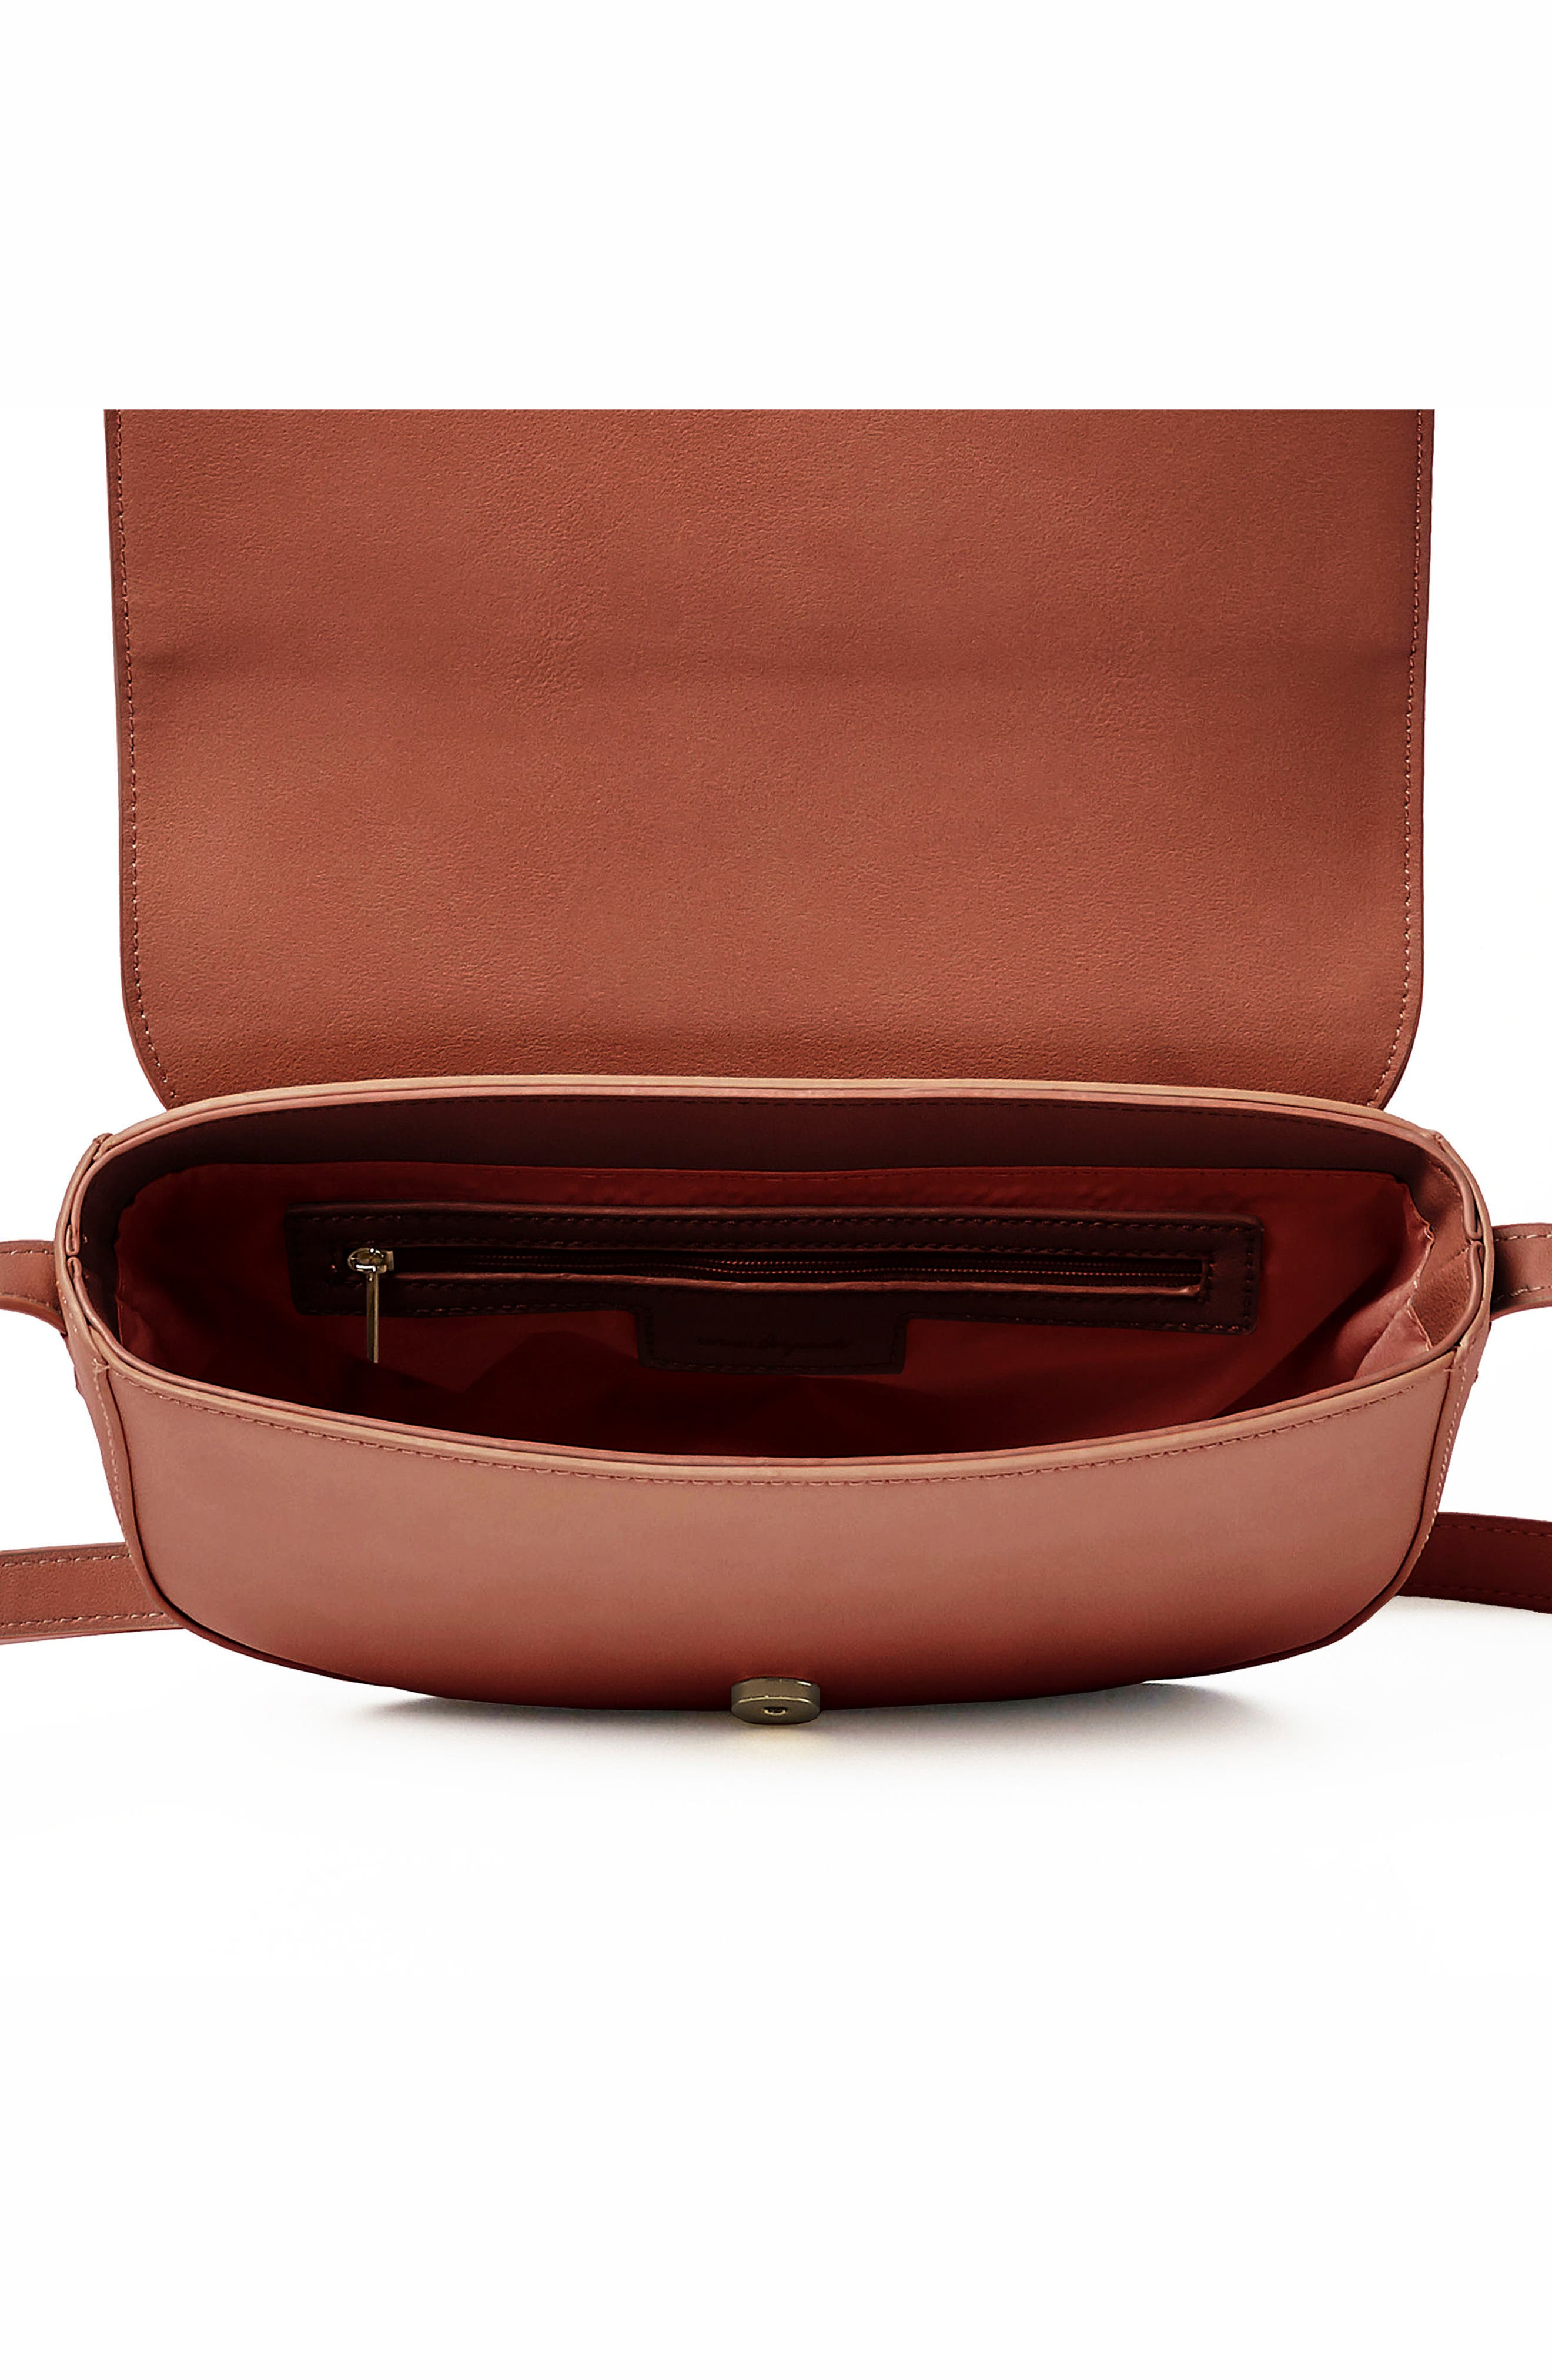 Lolita Vegan Leather Crossbody Bag,                             Alternate thumbnail 3, color,                             Pink